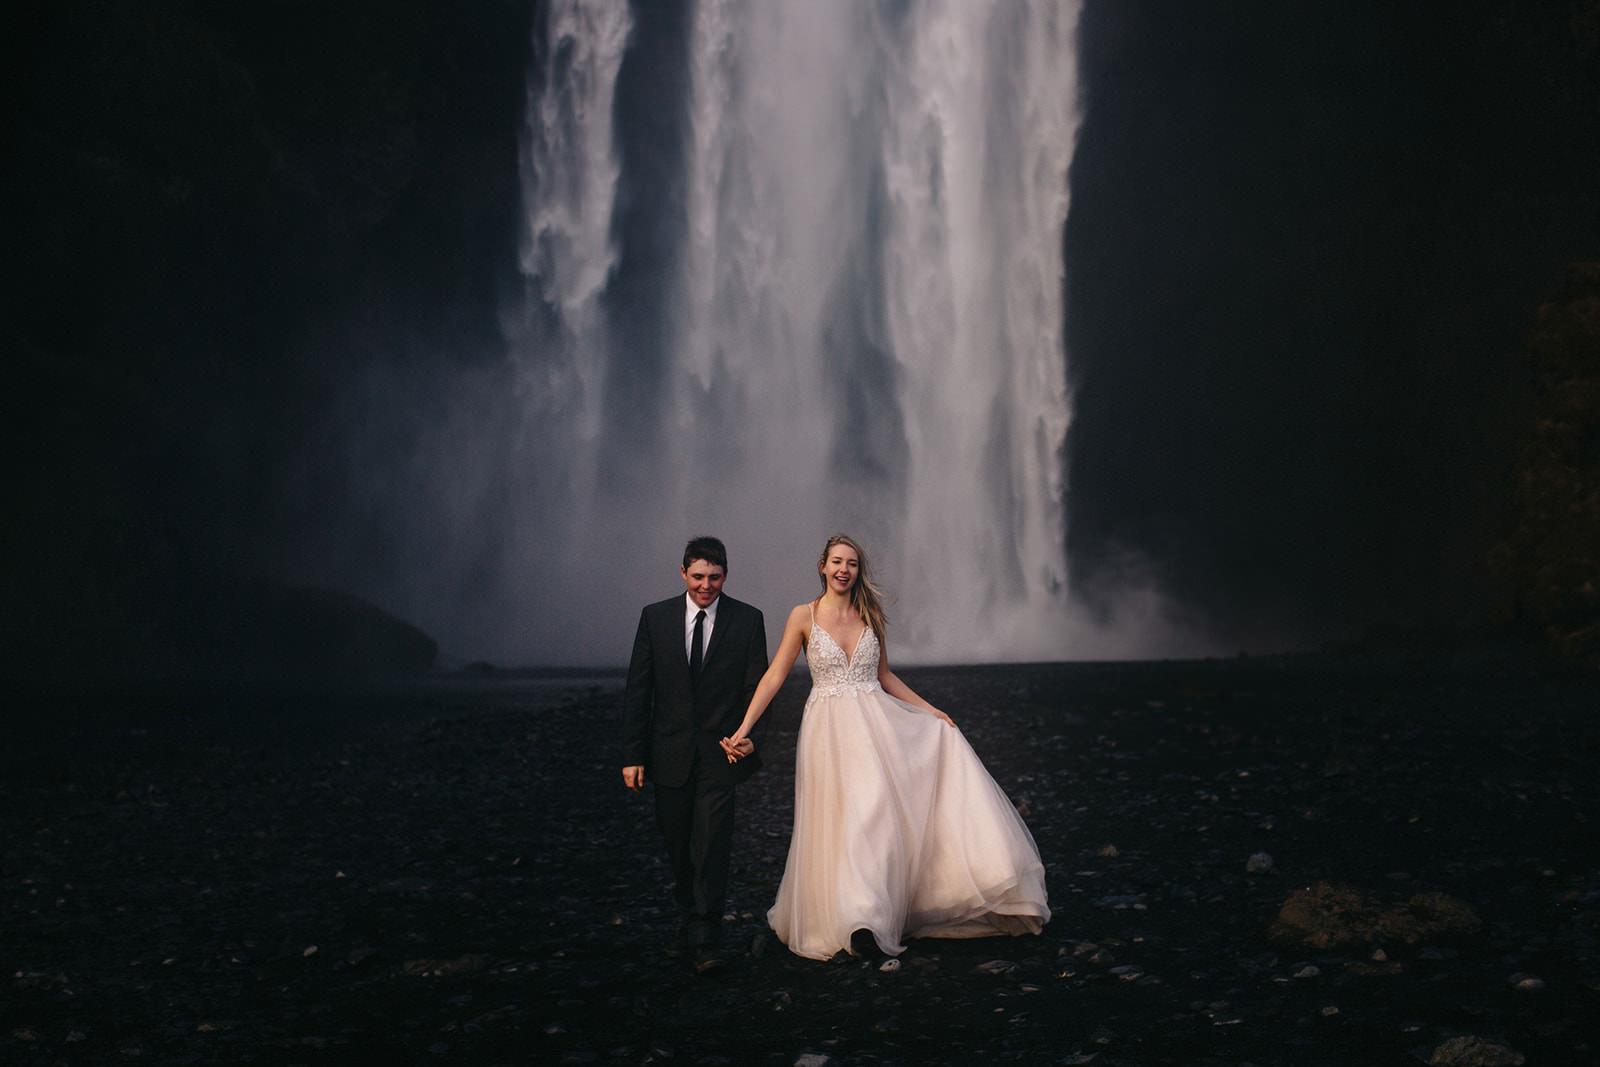 Icelandic Iceland Elopement Wedding Elope Photographer Eloping Reykjavík Vik Black Sand Beach Jökulsárlón Skogafoss Waterfall Vestrahorn Mountain Liz Osban Photography Destination 107.jpg